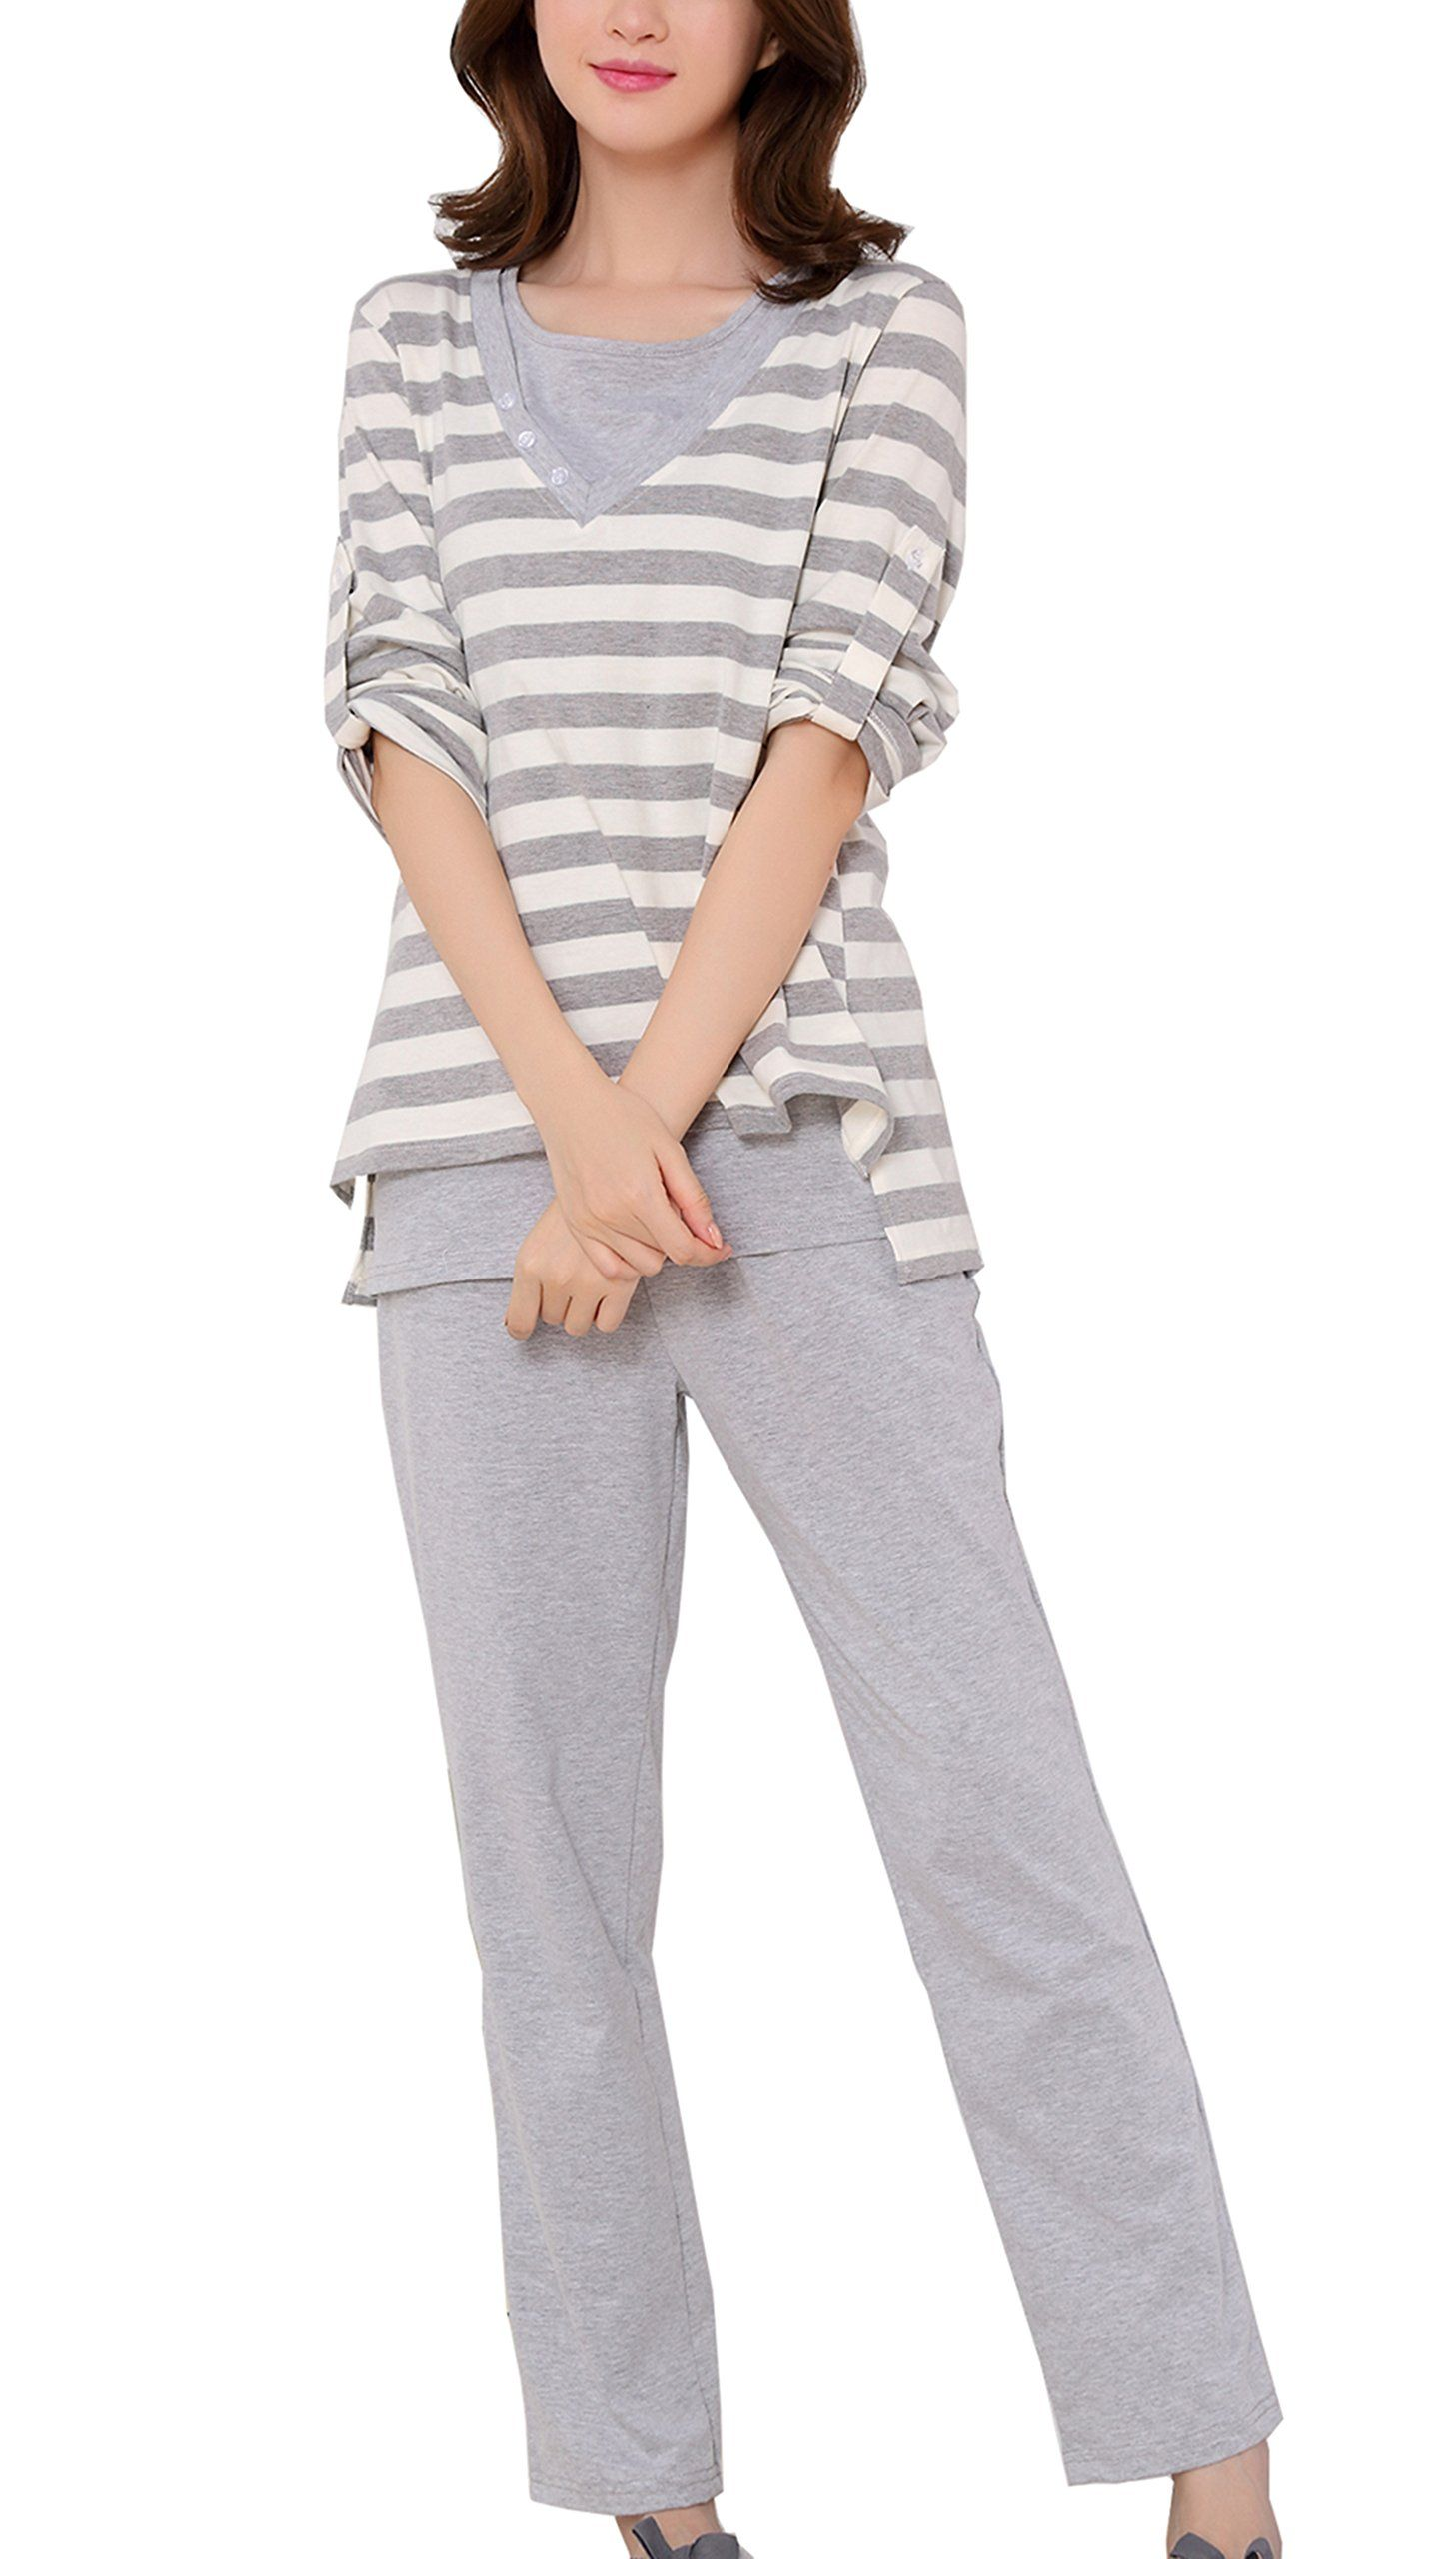 48f8a1e0050 nursing tops - Epmami Womens Nursing Pajamas 3 Piece Set Maternity  Breastfeeding Pajamas/PJS Sets Gray Small >>> Click image for even more  information.